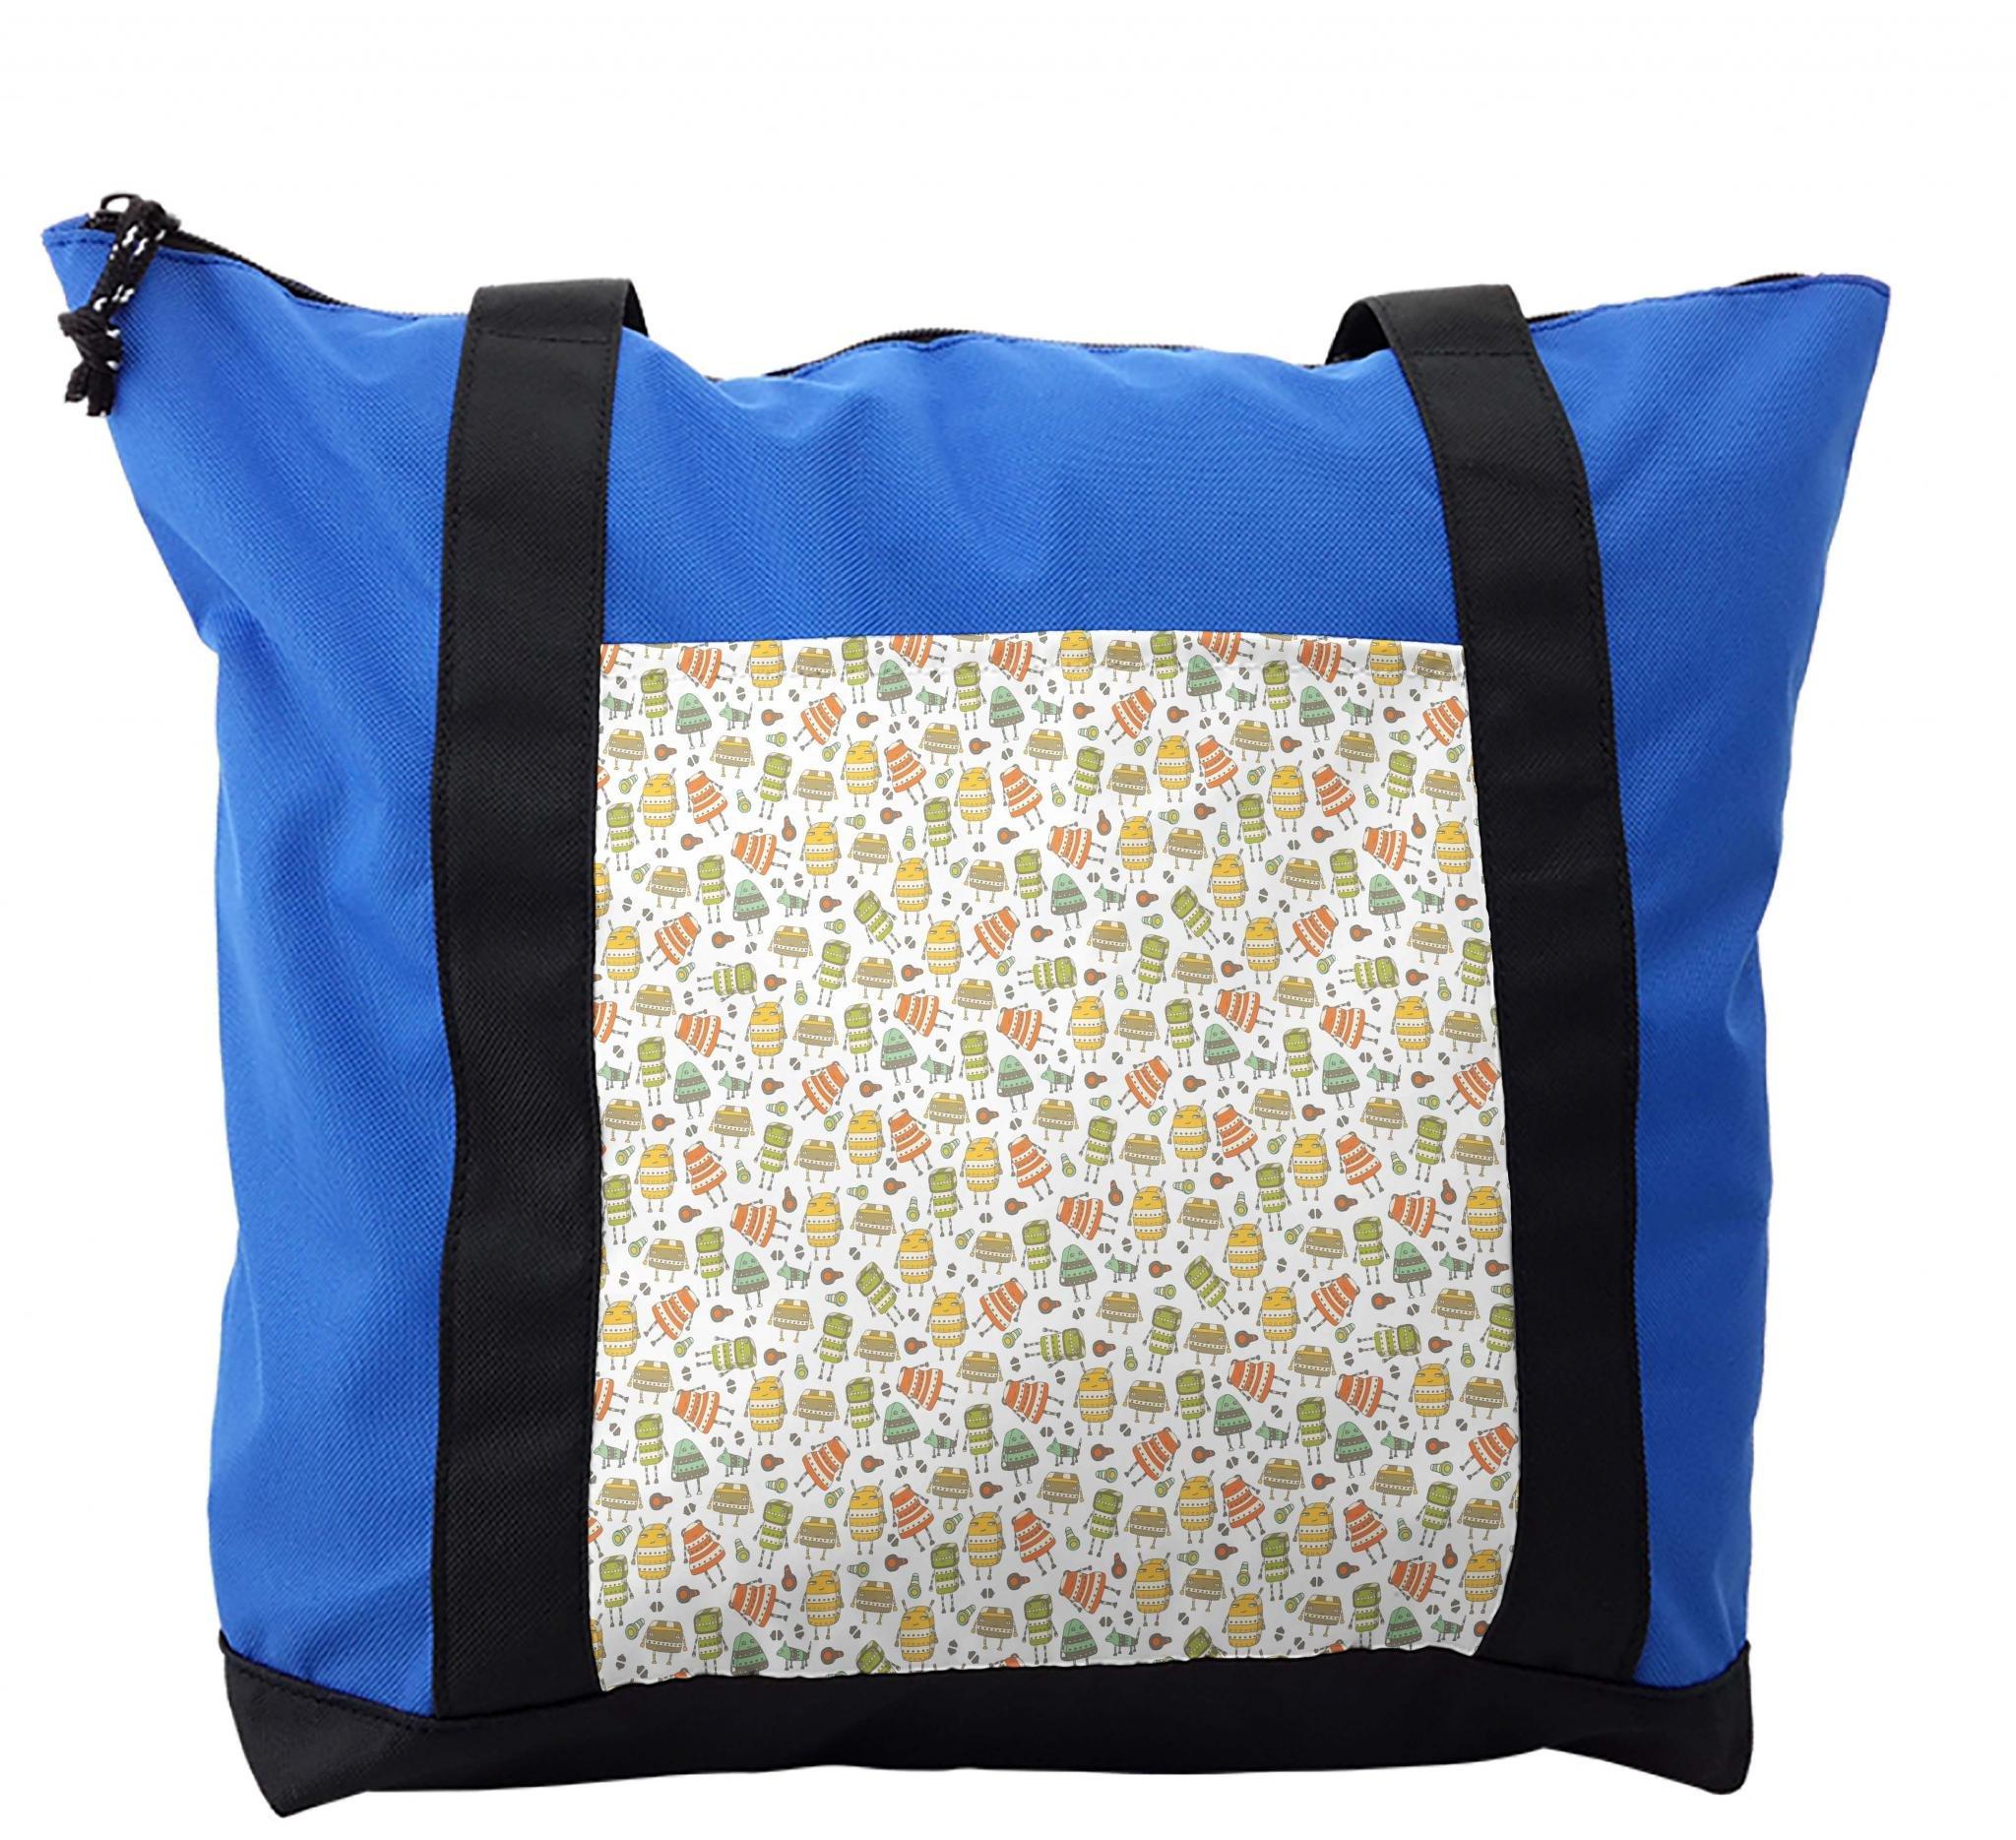 Lunarable Kids Shoulder Bag, Robots and Dogs Doodle Funny, Durable with Zipper